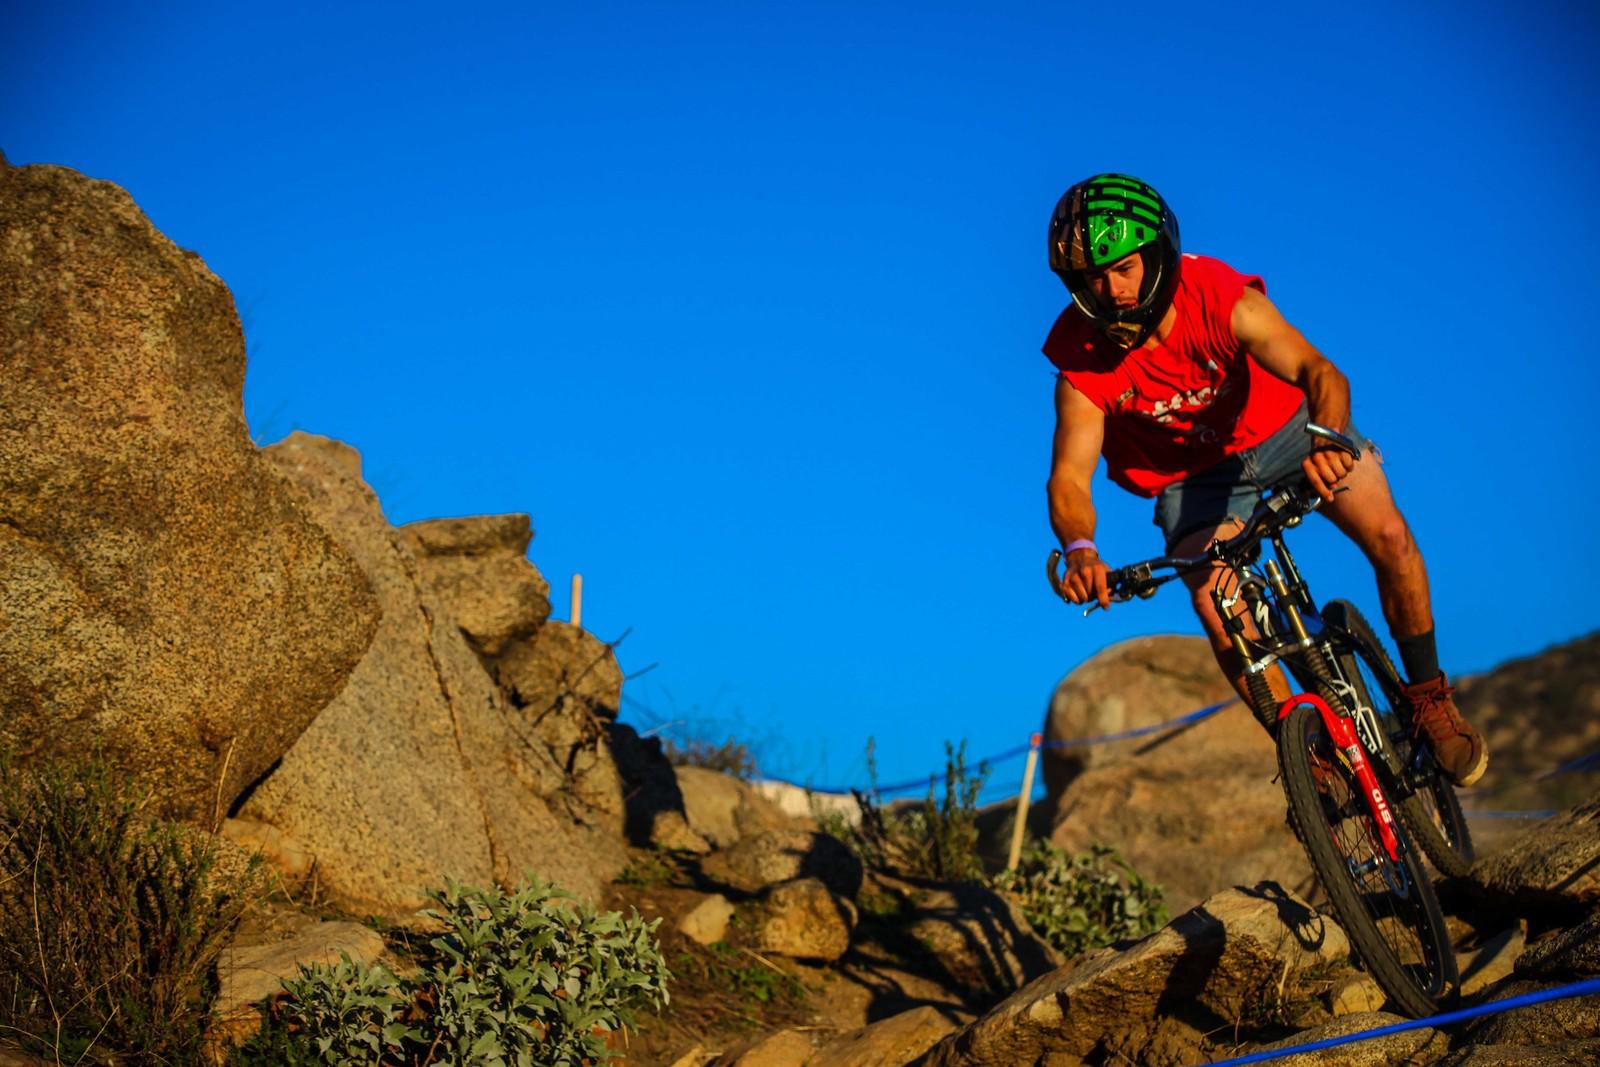 IMG 1692 - GnarHuck - Mountain Biking Pictures - Vital MTB